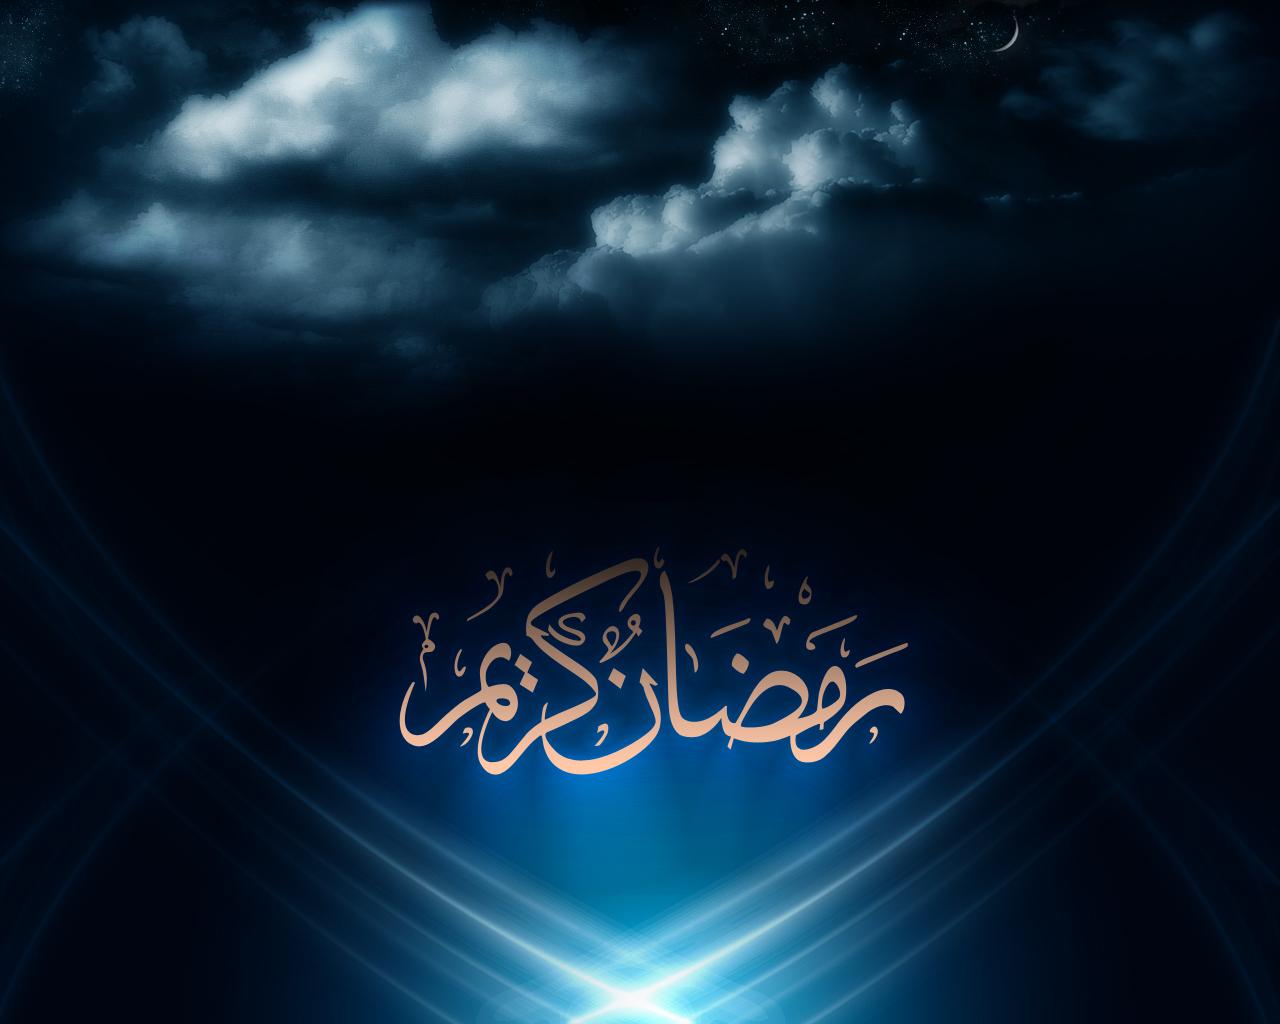 http://2.bp.blogspot.com/-T4jYNX25tVc/UASJp_6H1wI/AAAAAAAAAIM/eL0_eJuNm58/s1600/ramadan-wallpaper-blue.jpg